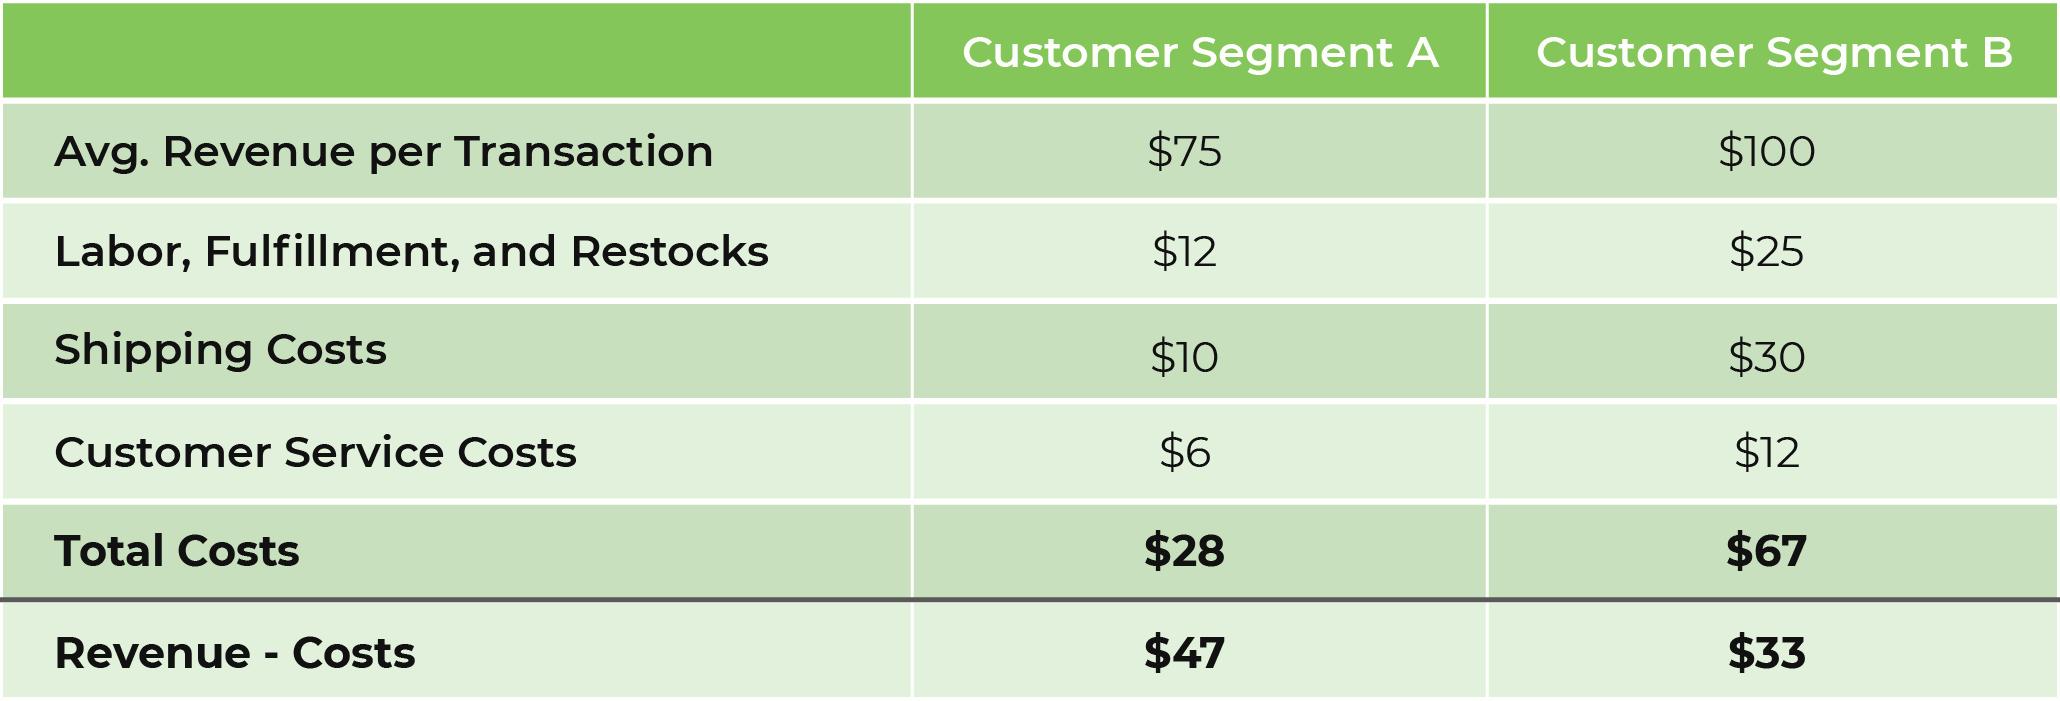 customer profitability analysis table showing segment A generates more revenue